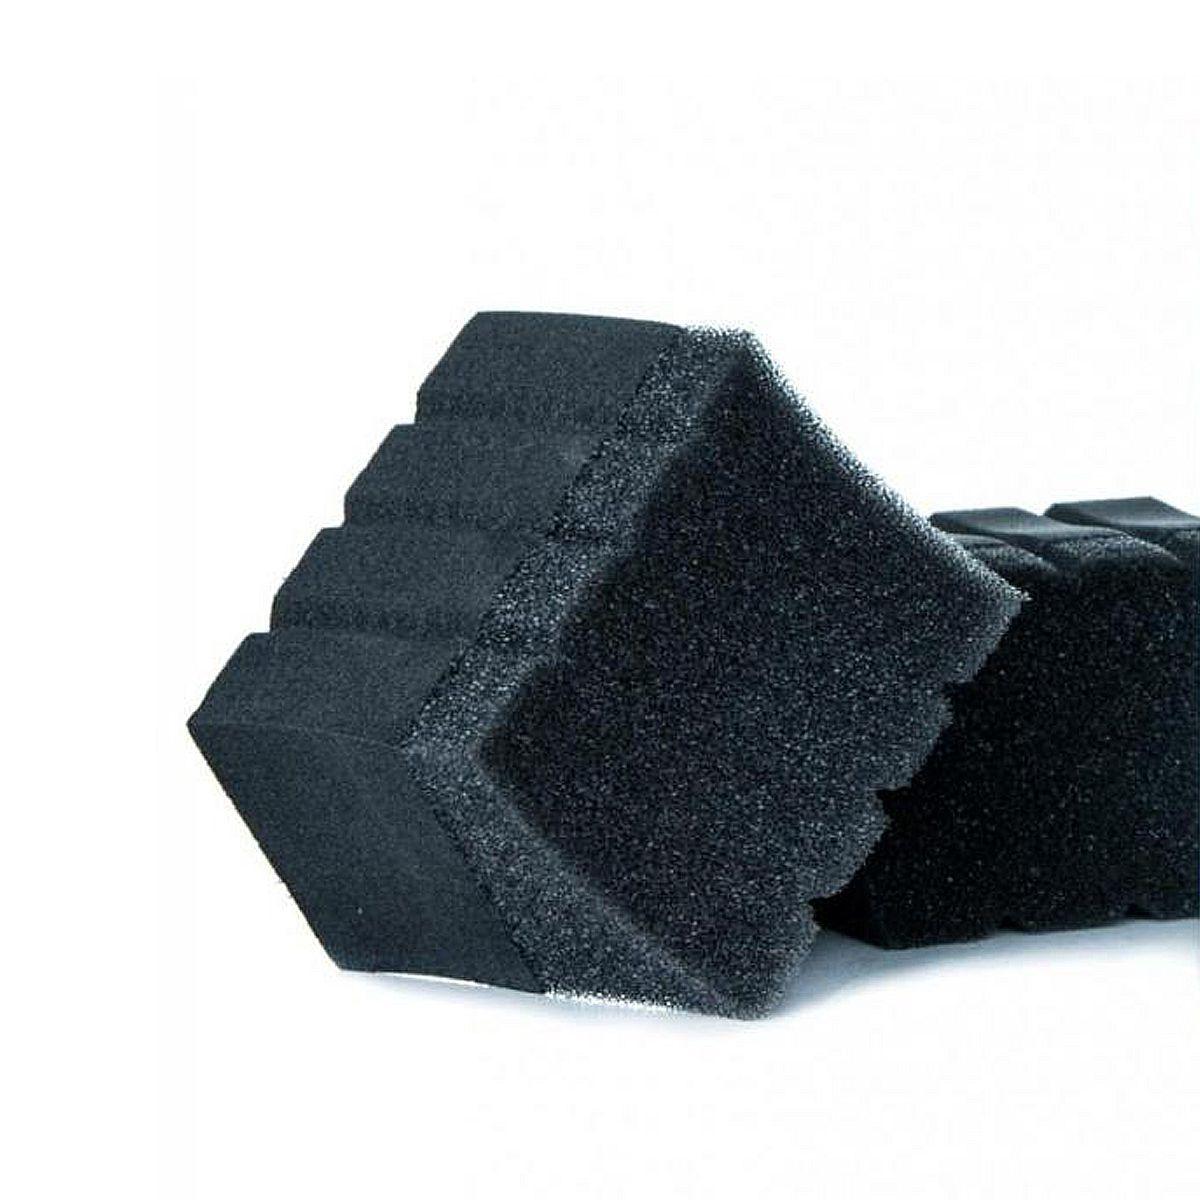 Esponja Especial para Pneus Tire Wax Sponge Soft99